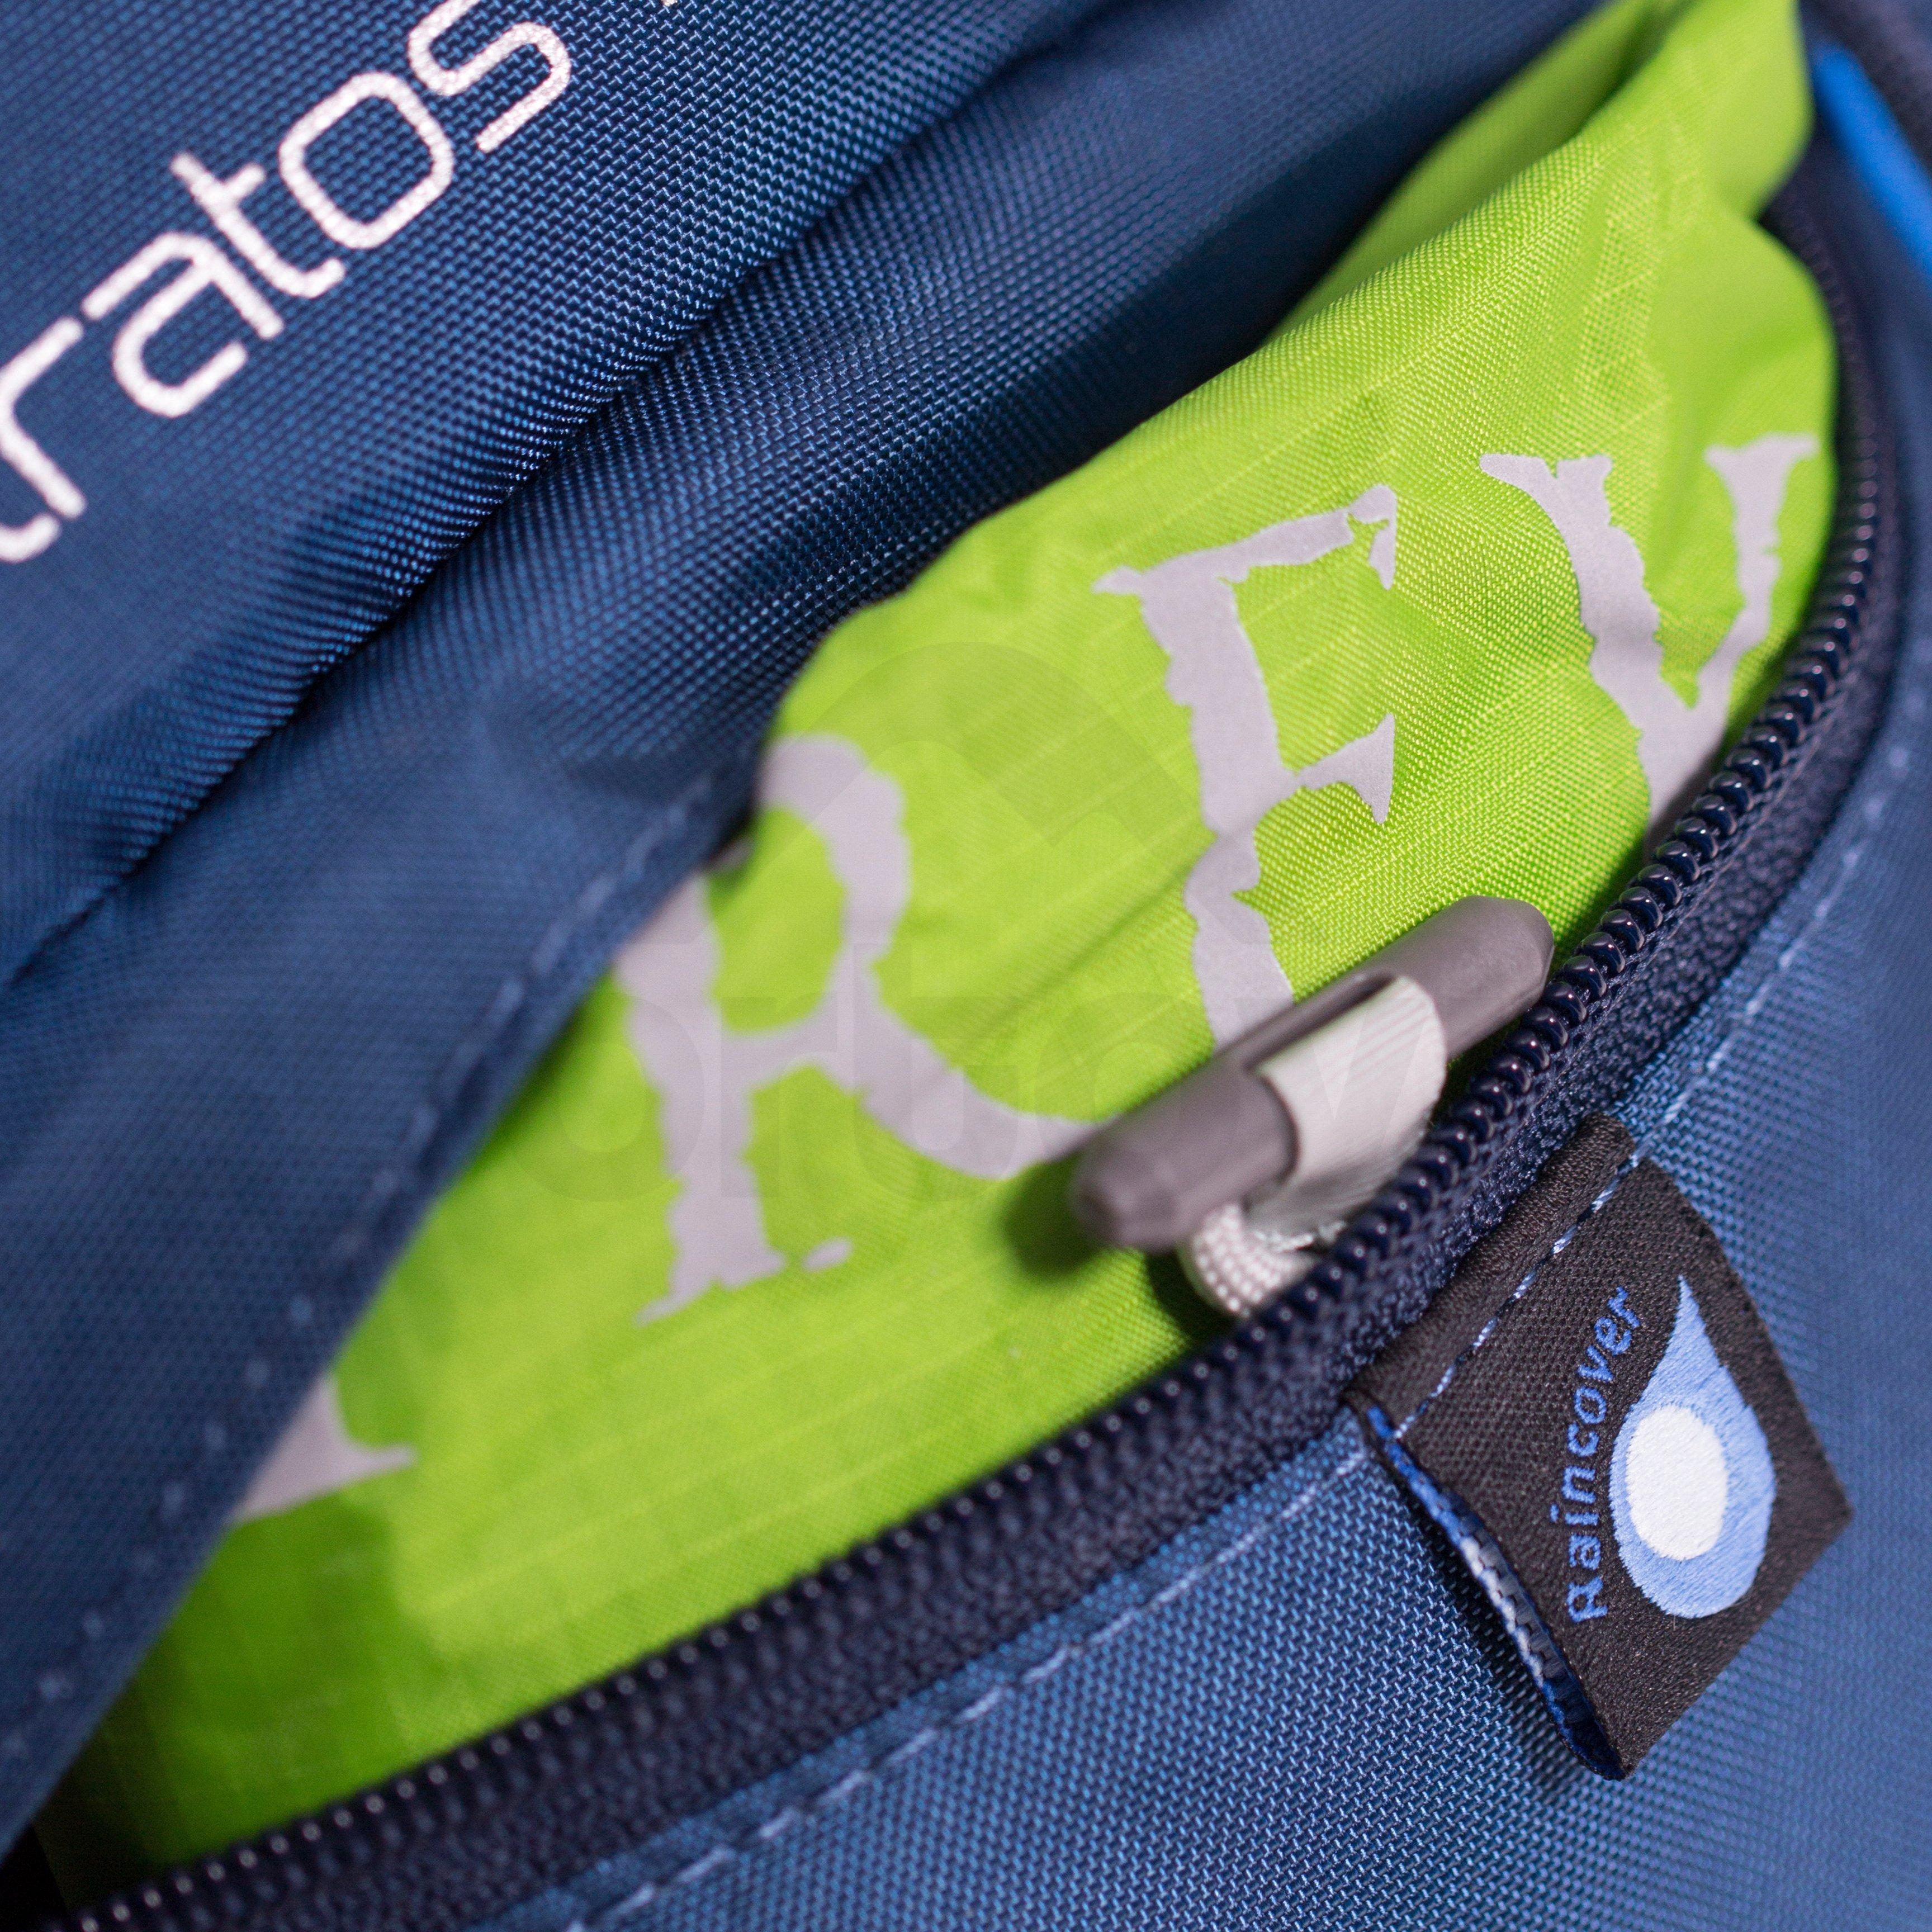 Pánský batoh Osprey Stratos 34 II - modrá